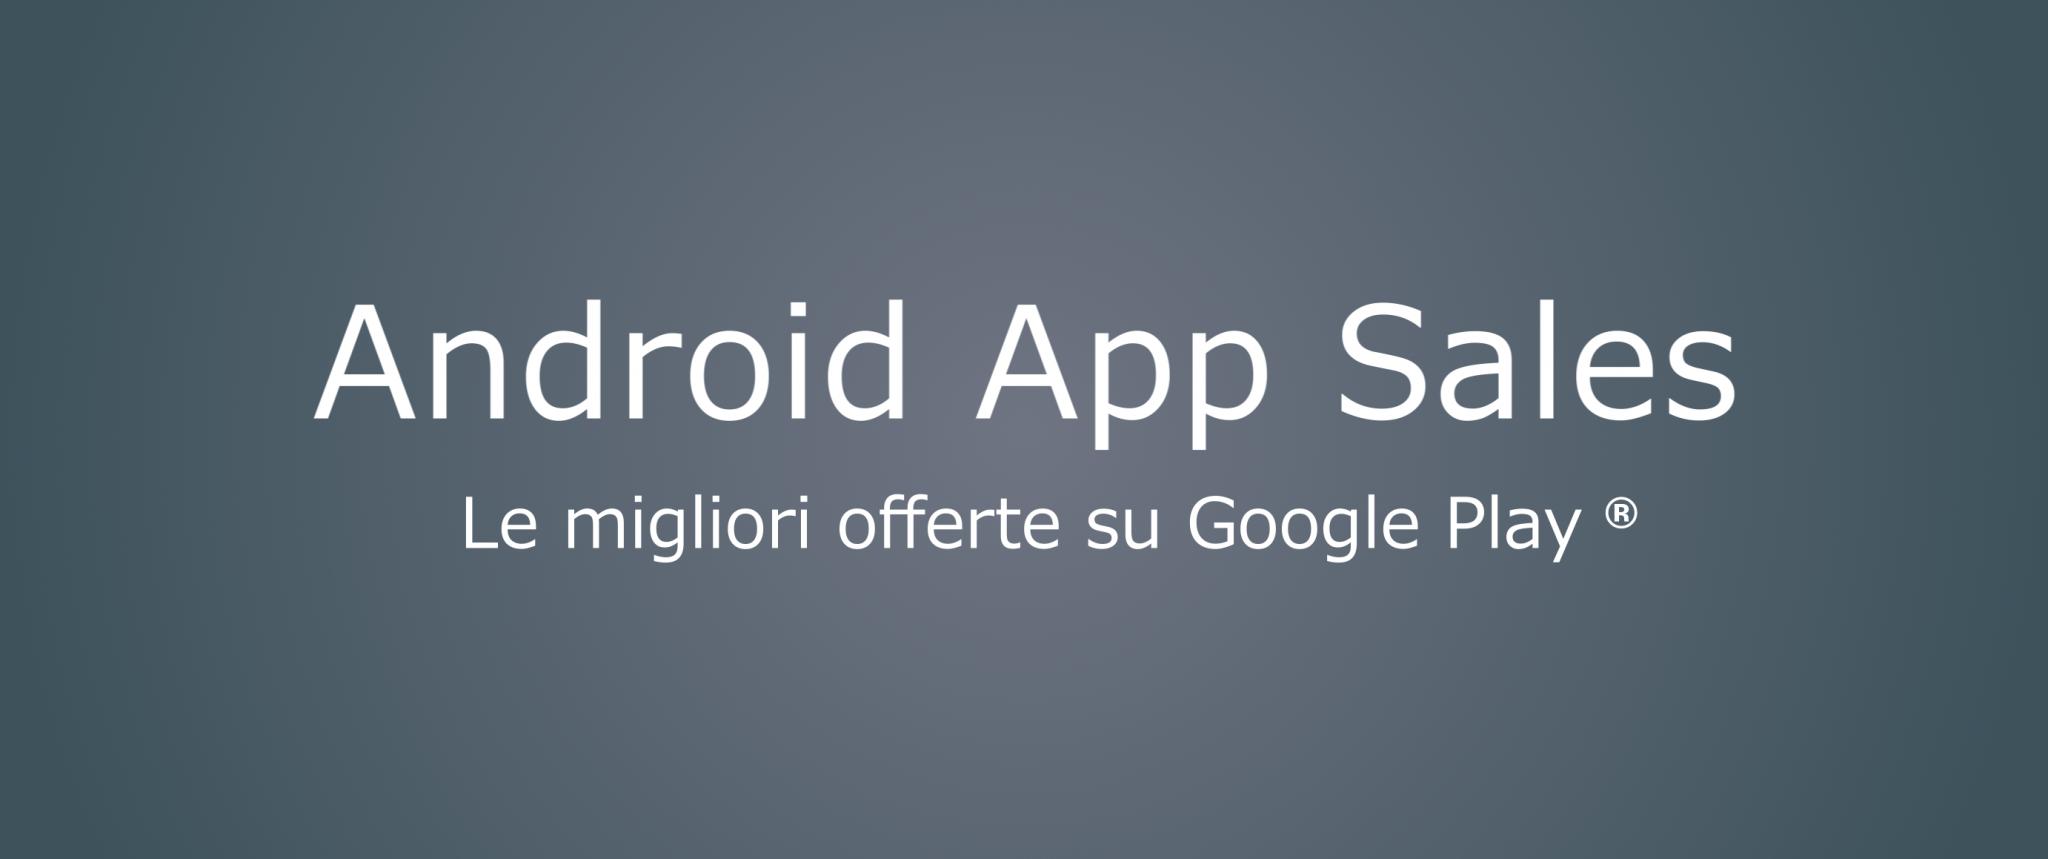 android-app-sales-avrmagazine1